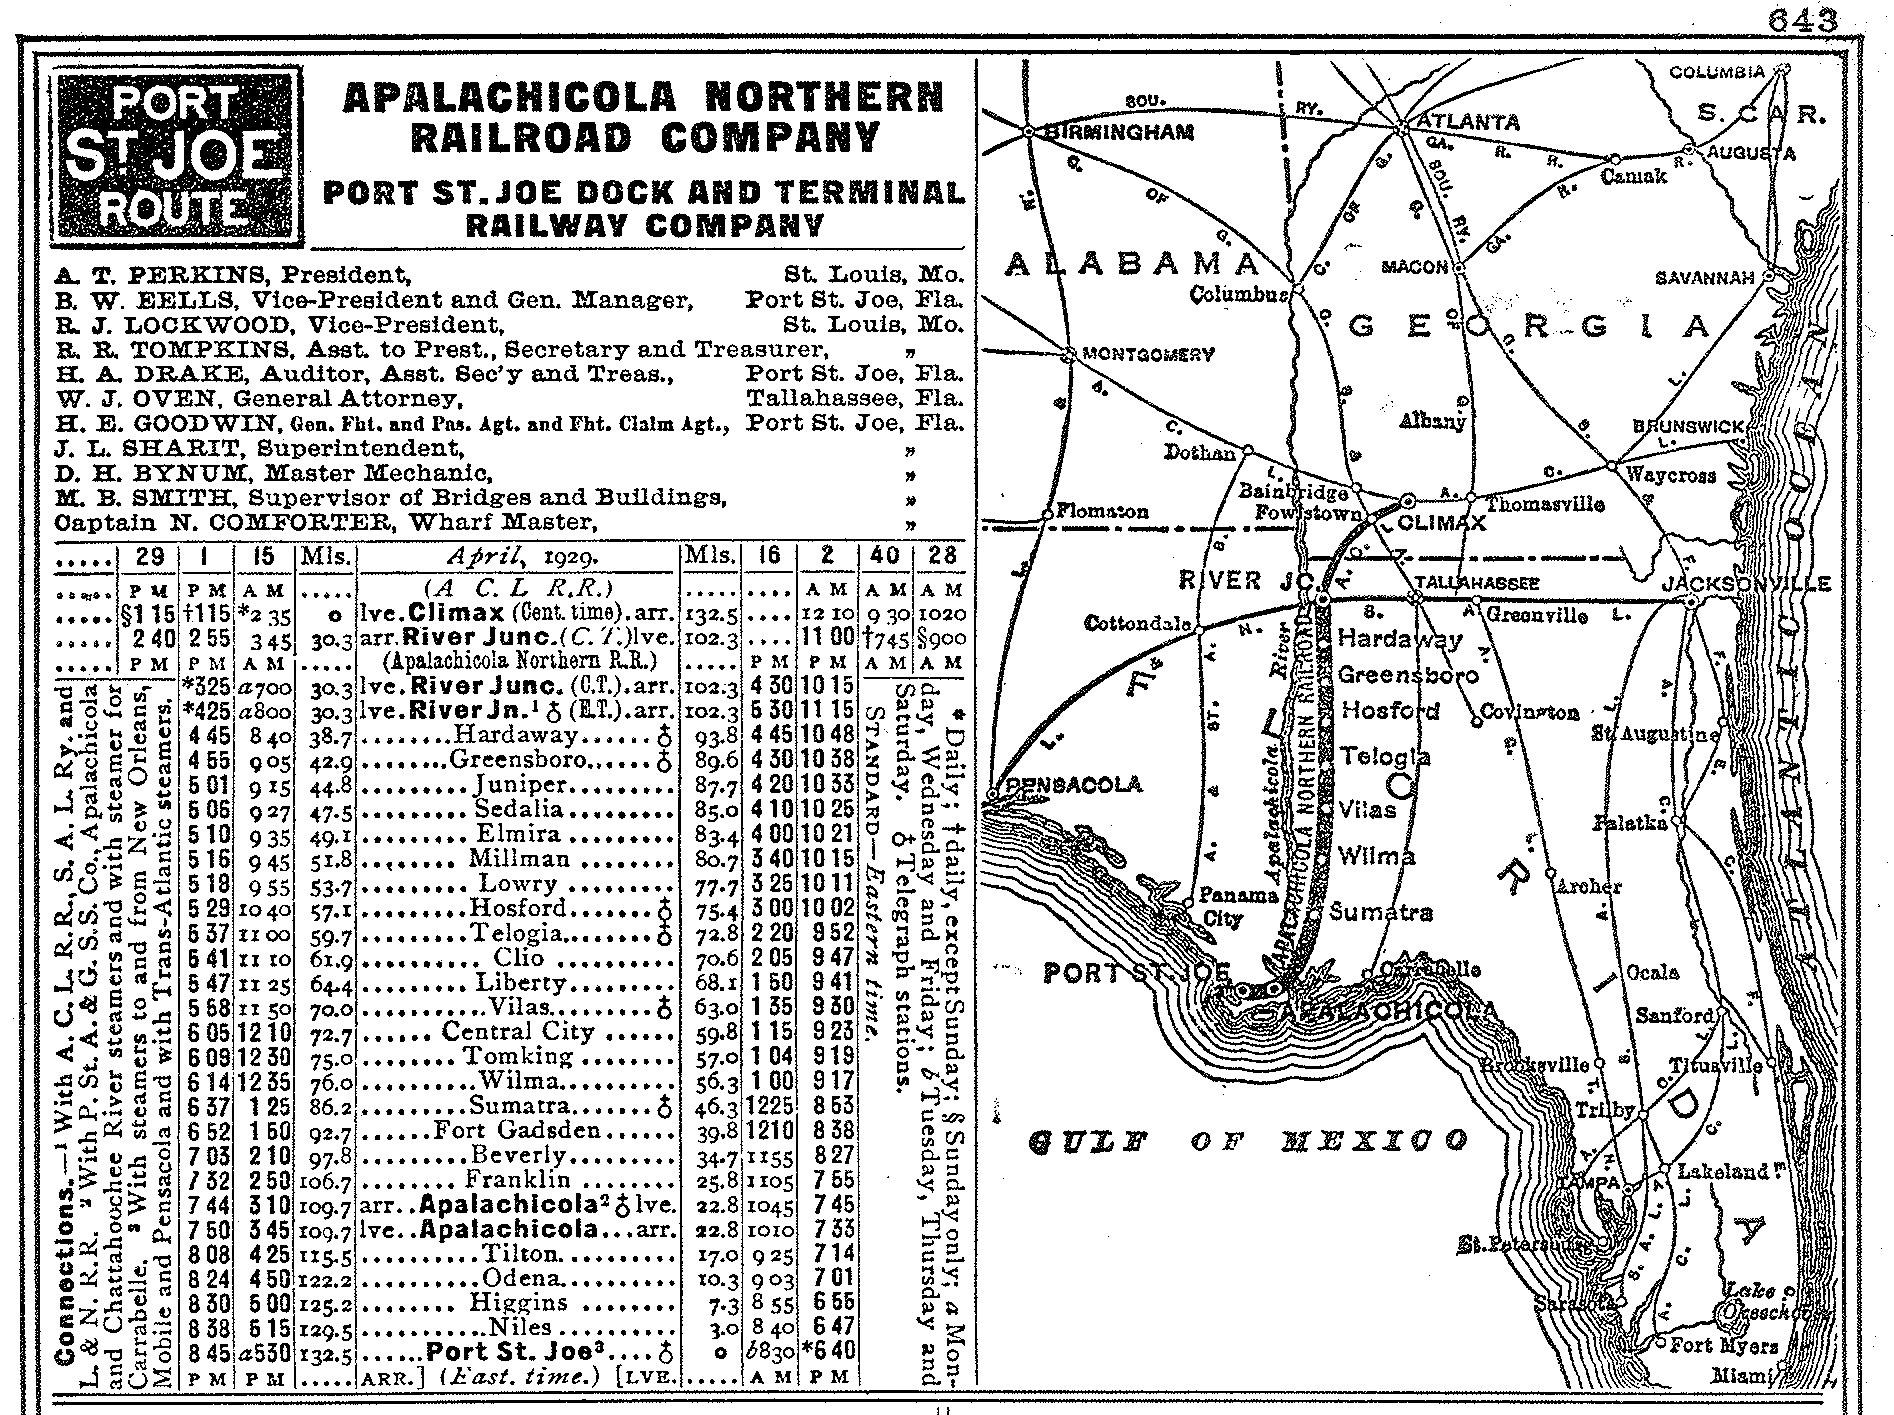 Transportation Company - Apalachicola Northern - Railroad